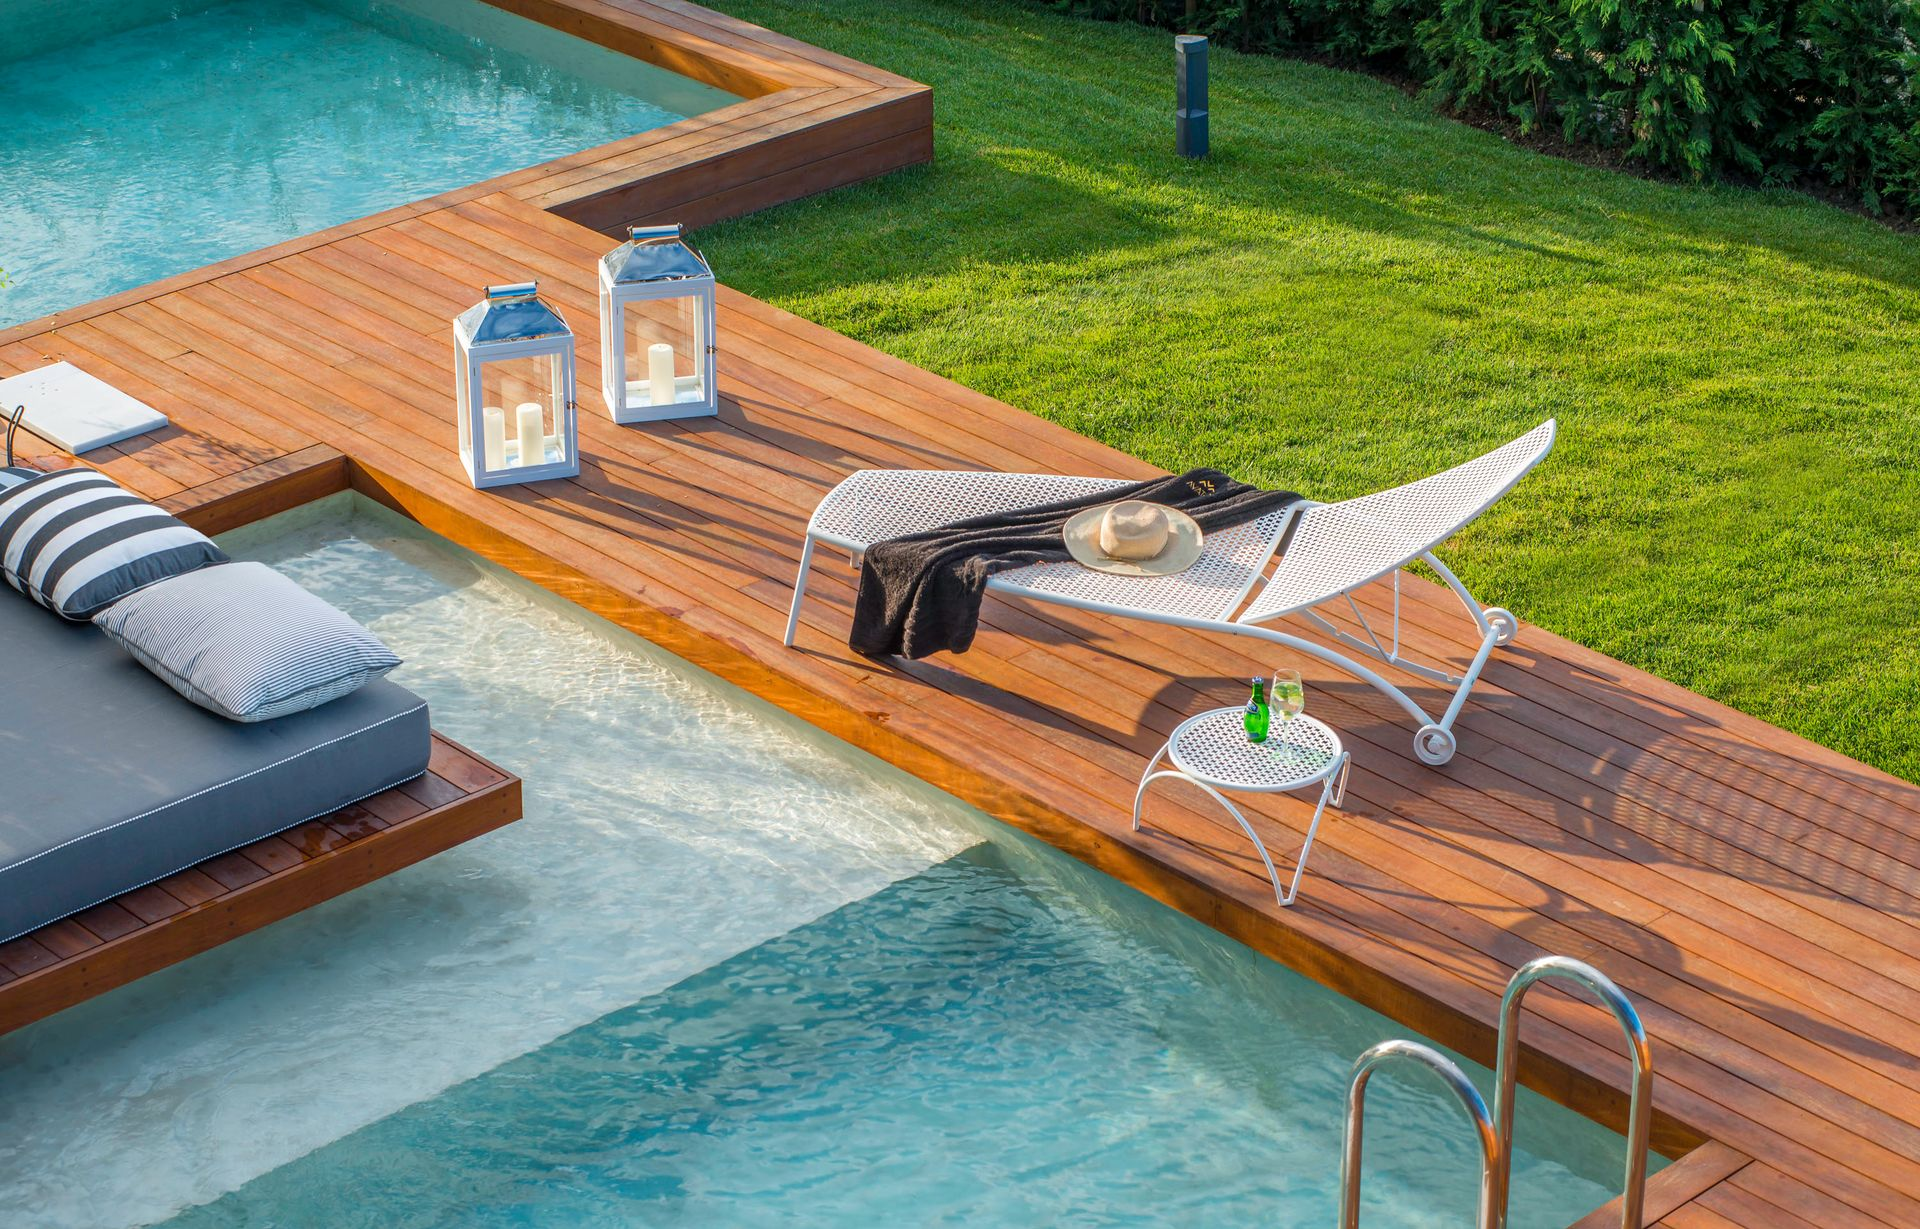 Avaton Luxury Villas Resort Relais & Chateaux – Ουρανουπολη, Χαλκιδικη ✦ 2 Ημερες (1 Διανυκτερευση) ✦ 2 Άτομα ΚΑΙ ενα Παιδι εως 3 ετων ✦ Ημιδιατροφη ✦ 01/09/2018 εως 30/09/2018 ✦ Μπροστα στην Παραλια!